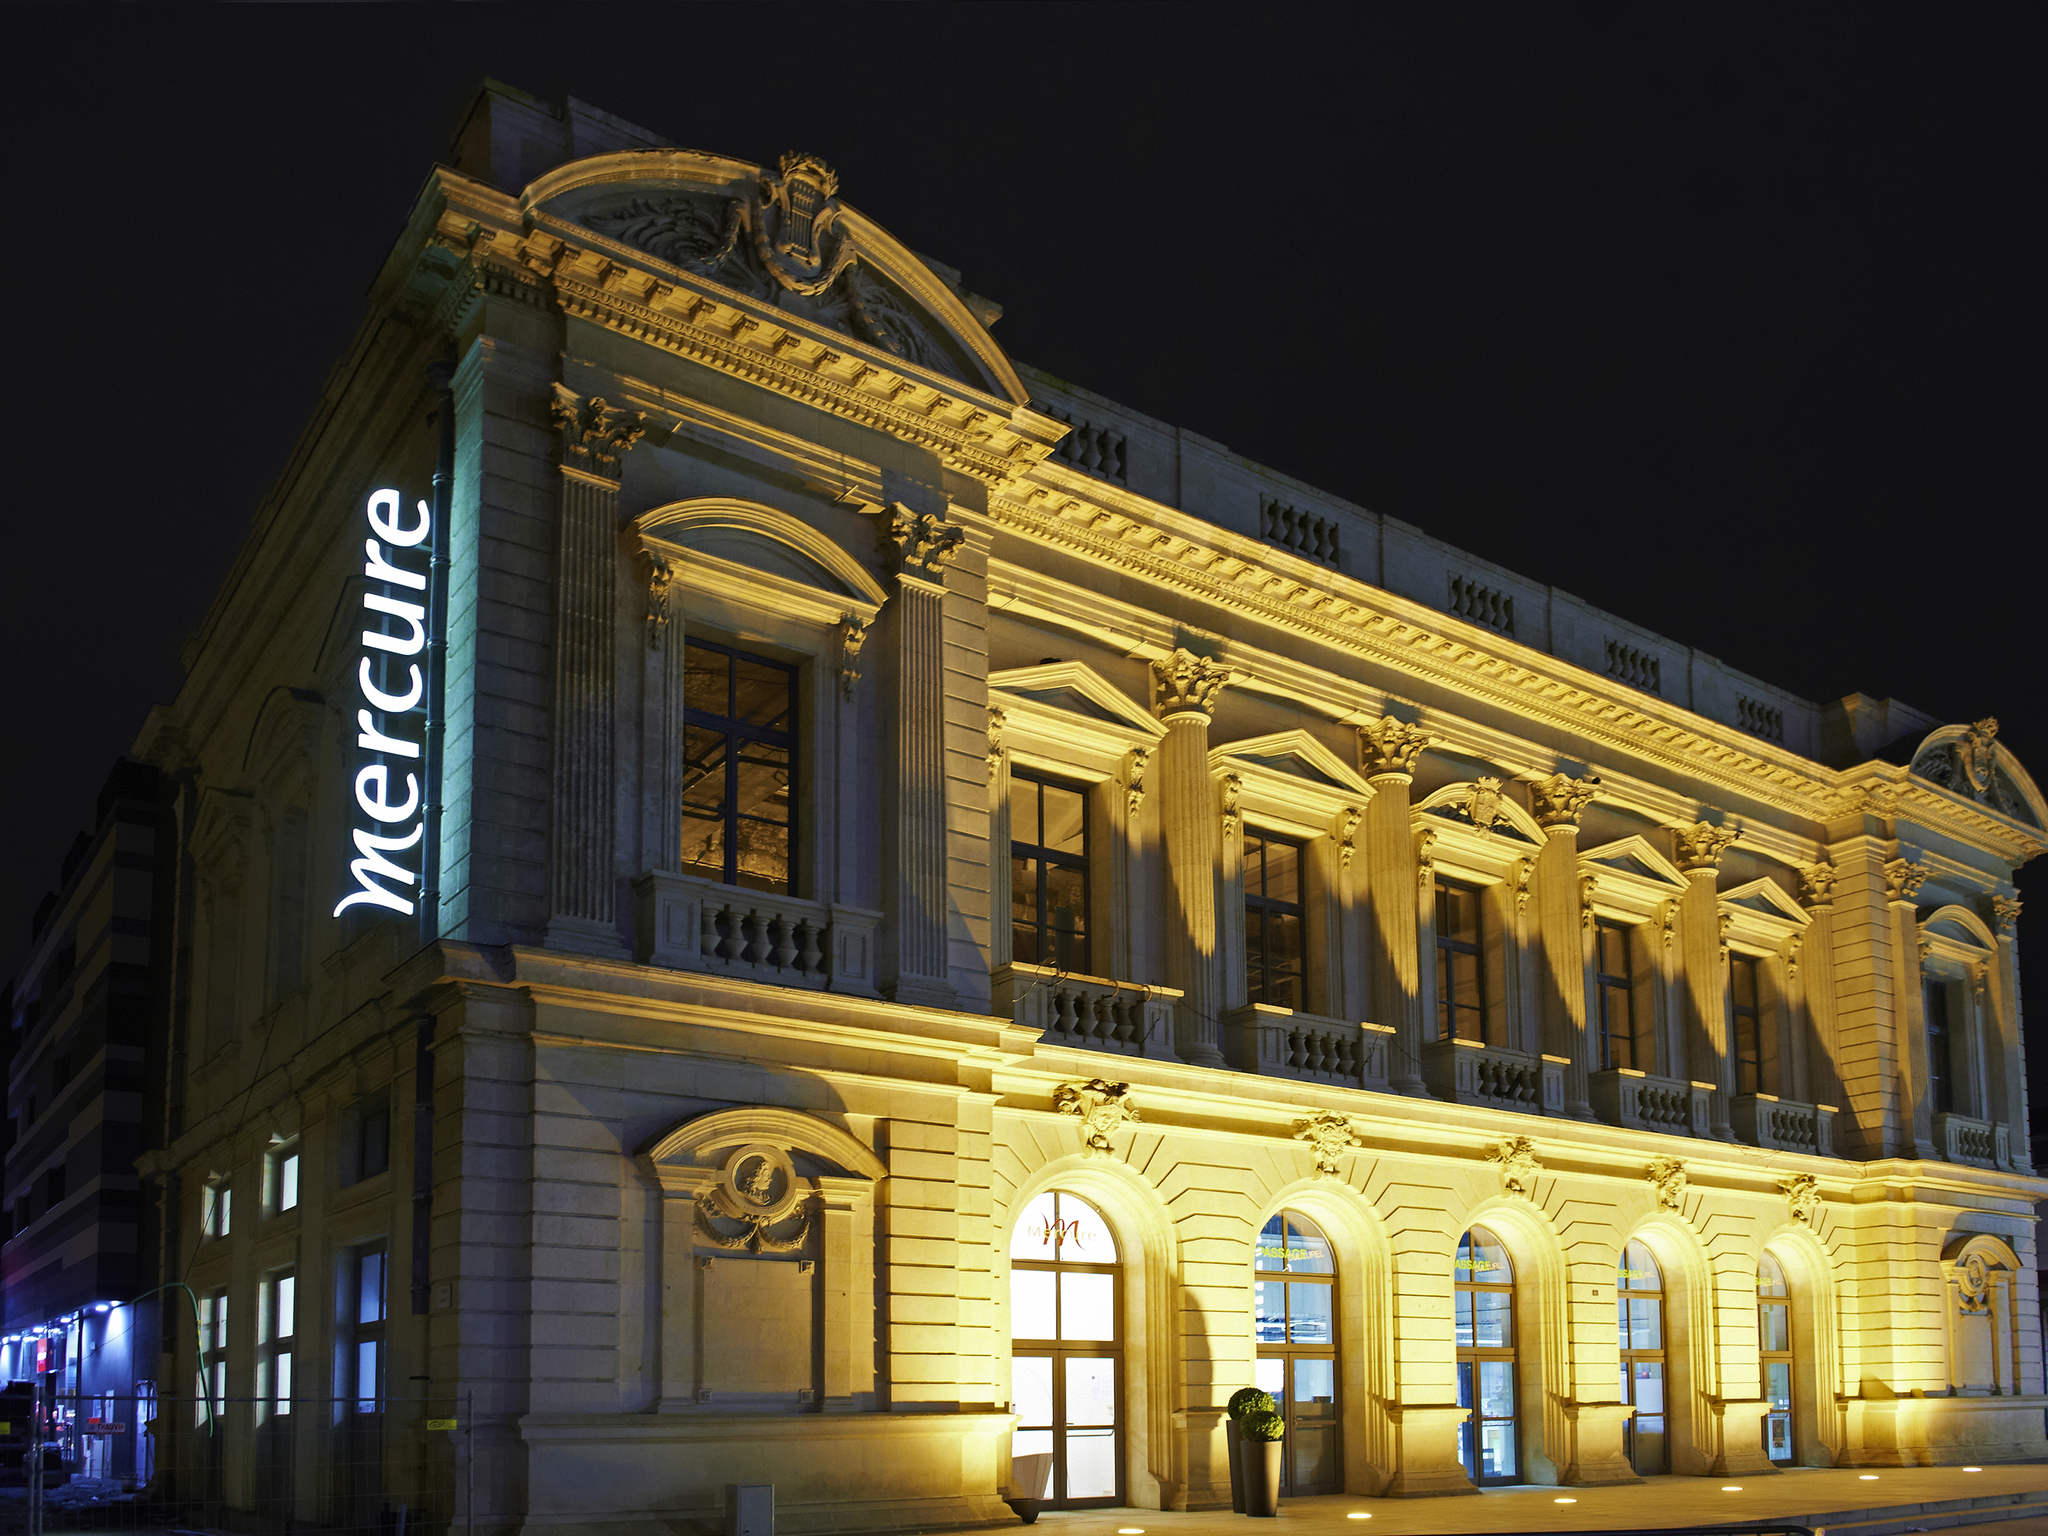 Hotel - Mercure Cholet Centre Hotel